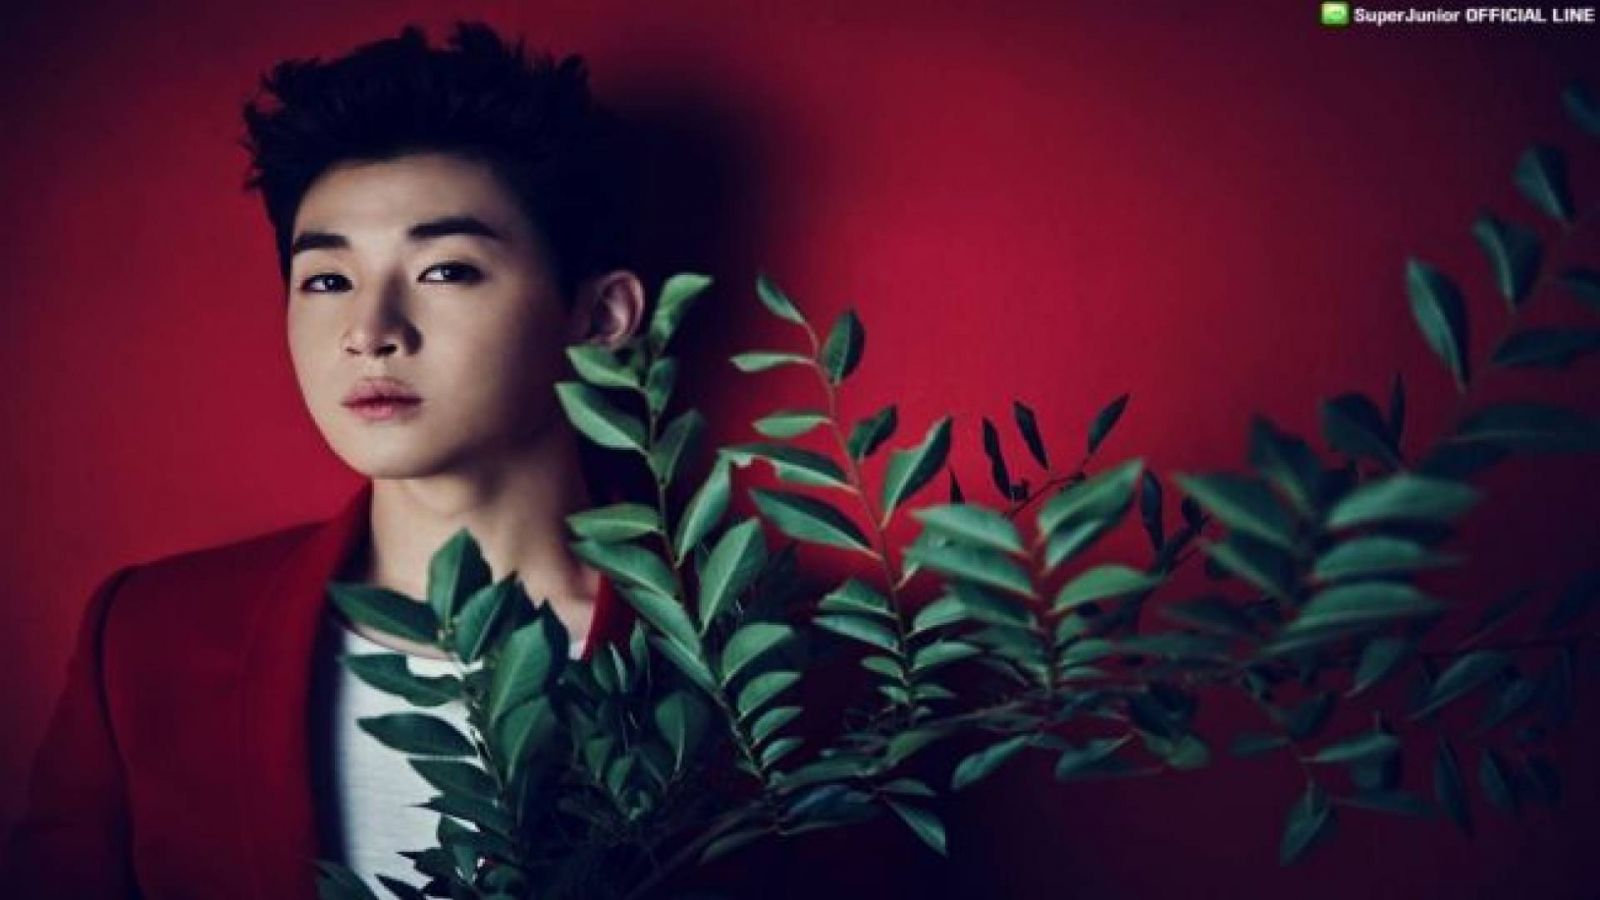 Henry apresenta seu segundo mini-álbum, Fantastic © Super Junior OFFICIAL LINE